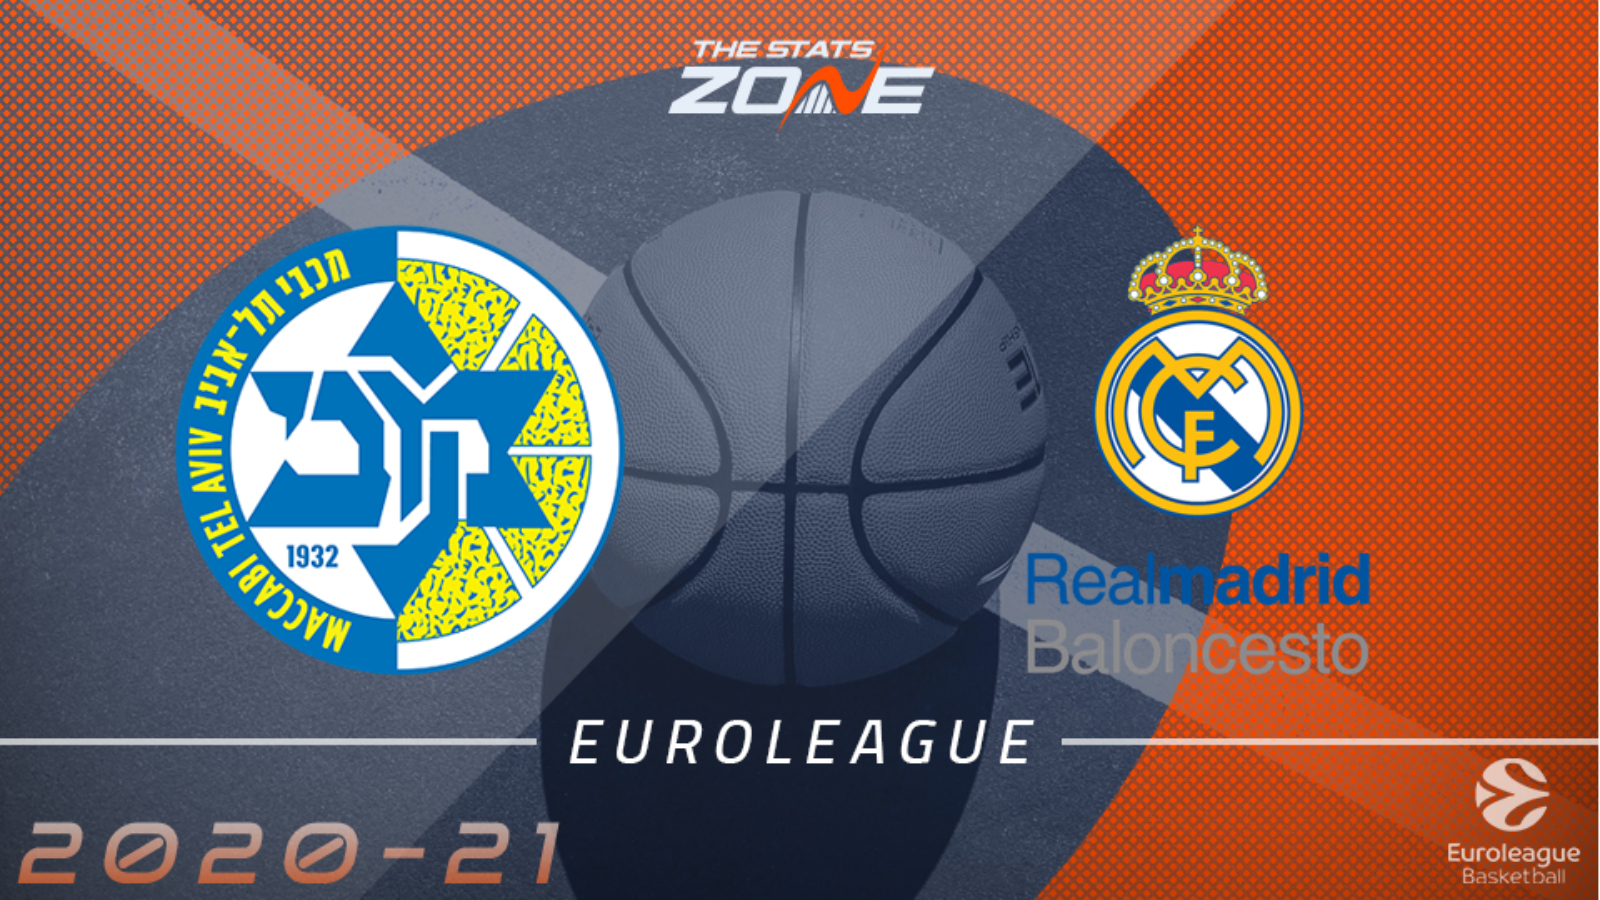 2020-21 EuroLeague – Maccabi Playtika Tel Aviv vs Real ...